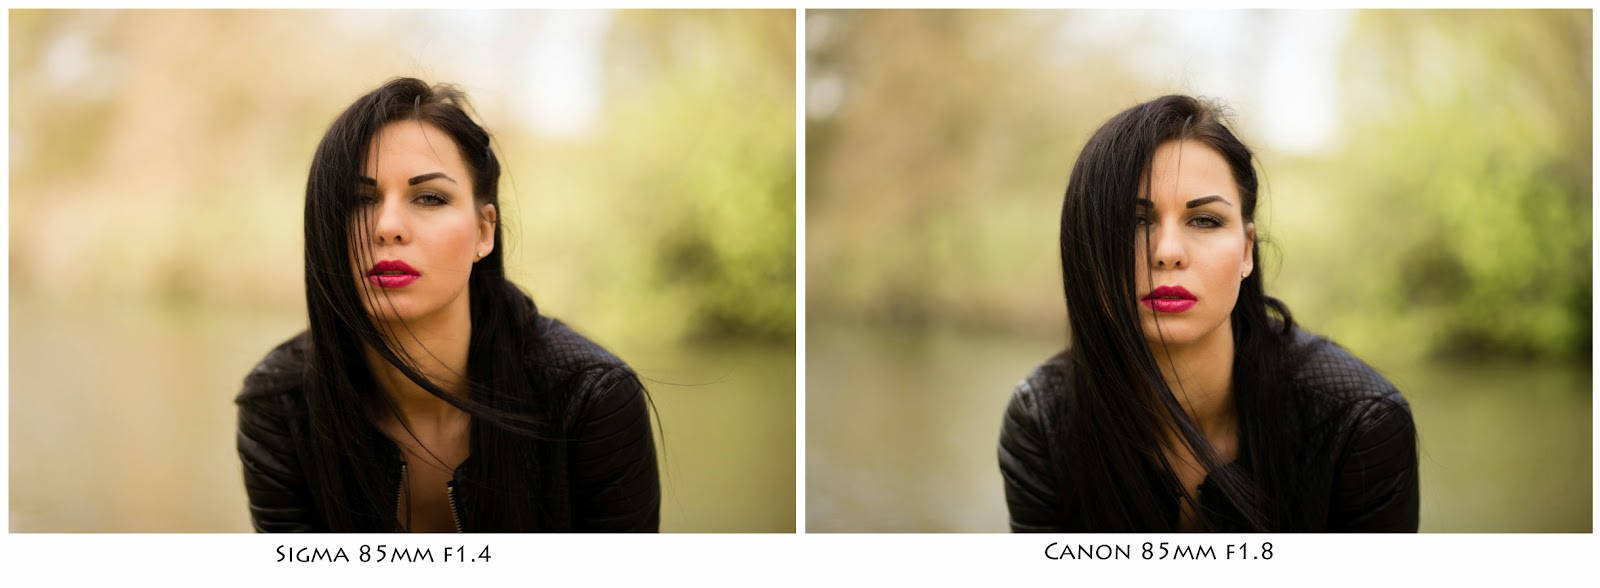 Yat Tang Photographer: Bokeh Blur Comparison Sigma 85mm f1.4 Vs ...